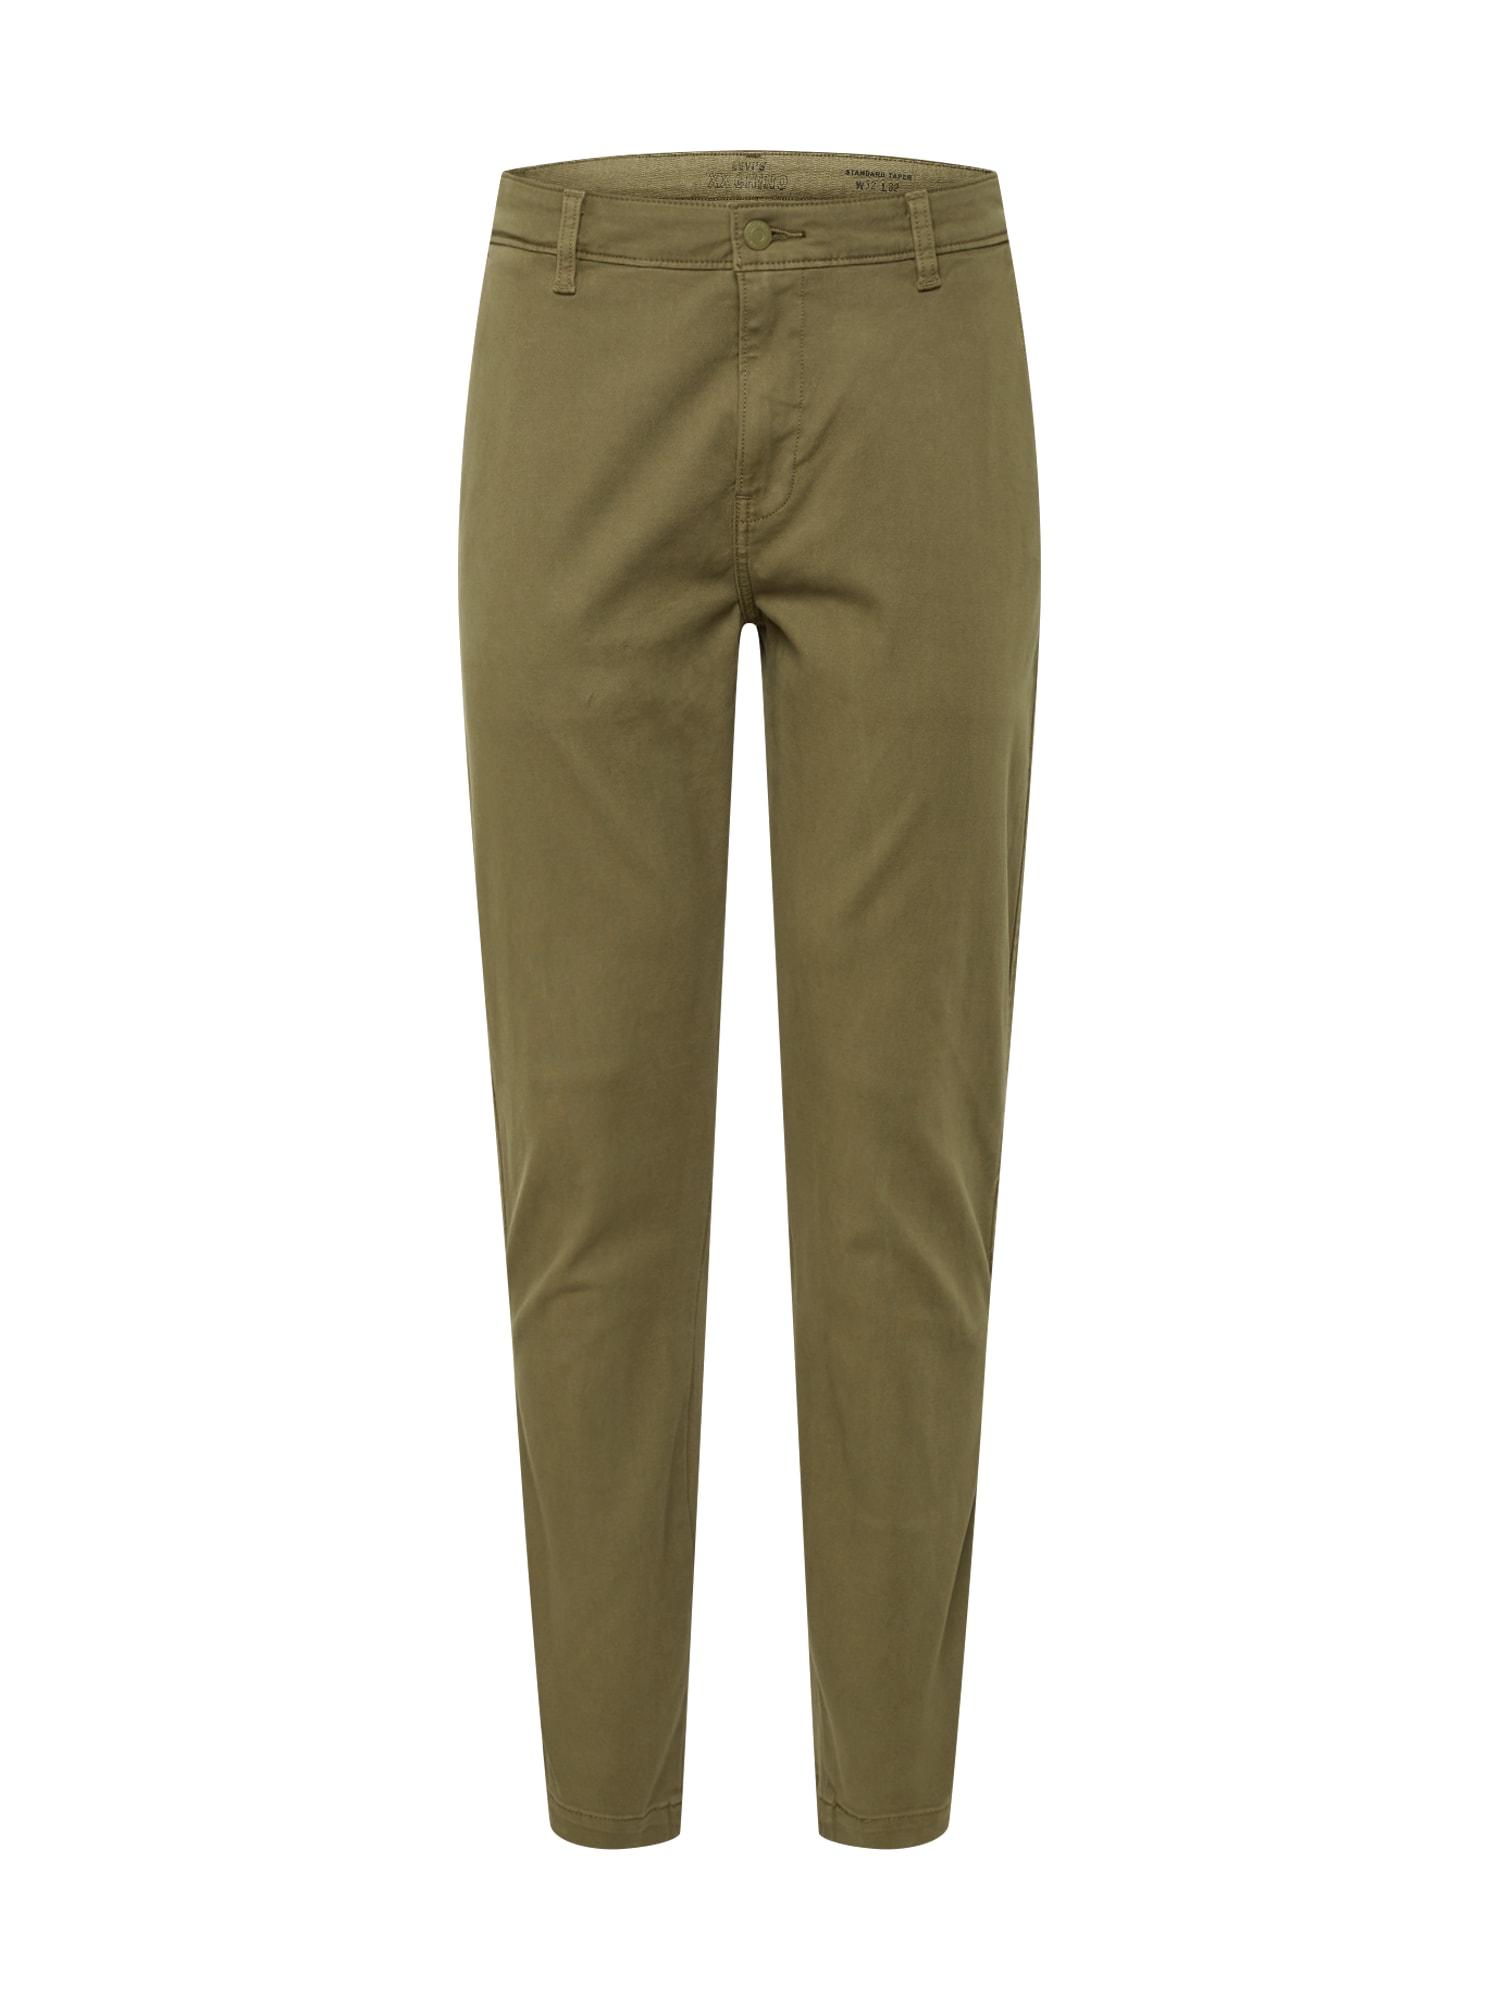 LEVI'S Chino kalhoty 'STANDARDTAPERCHINOII'